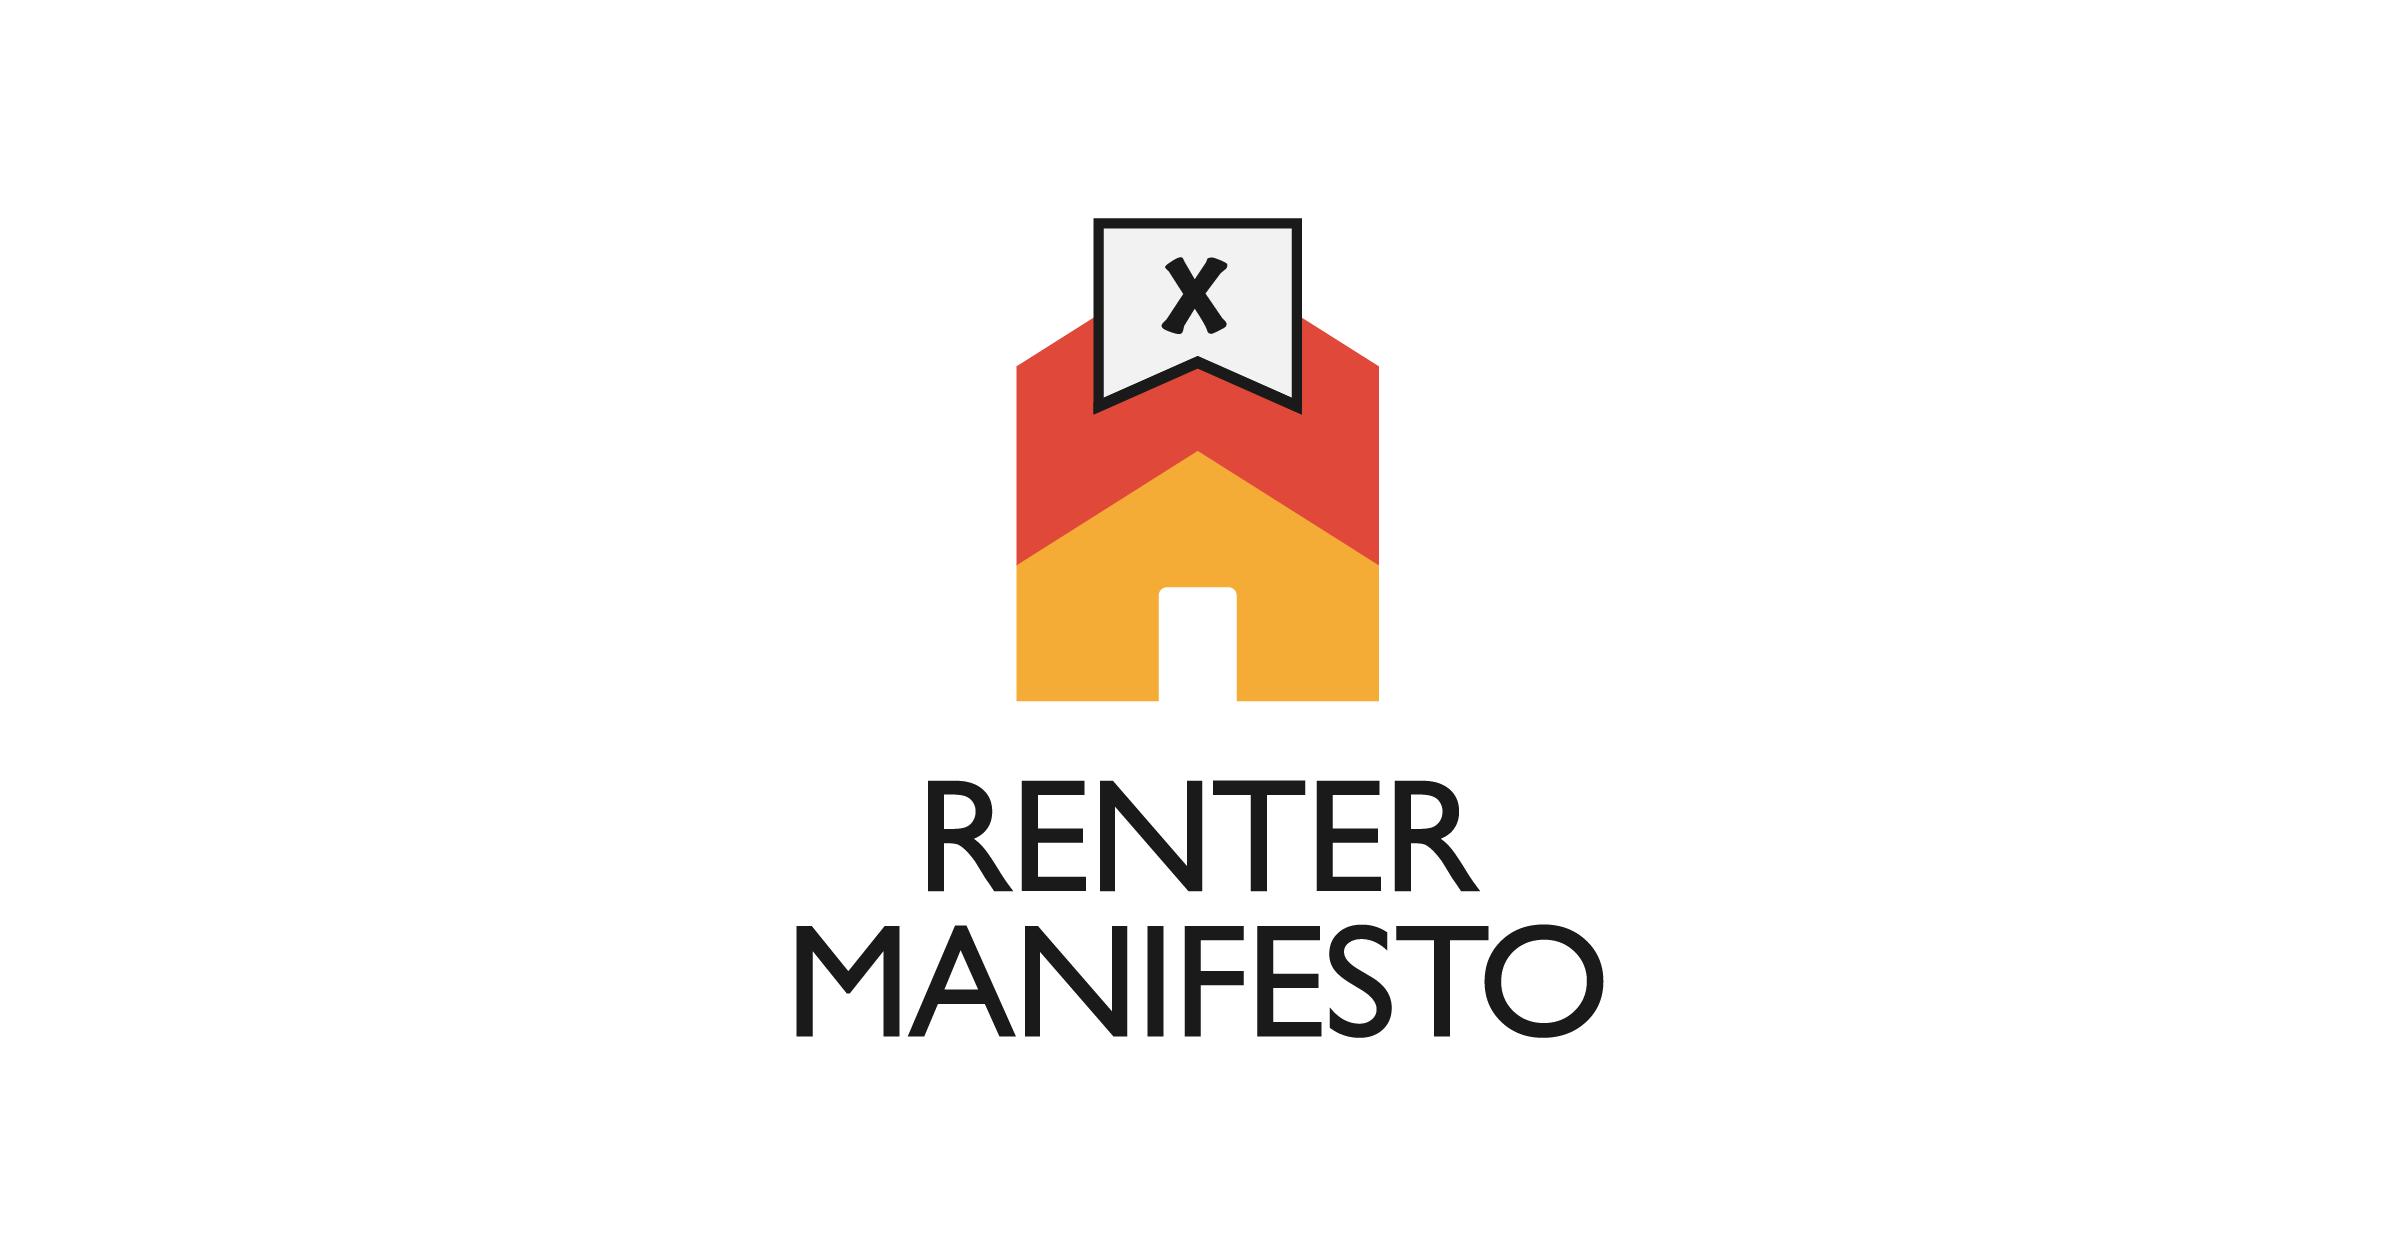 Renter Manifesto